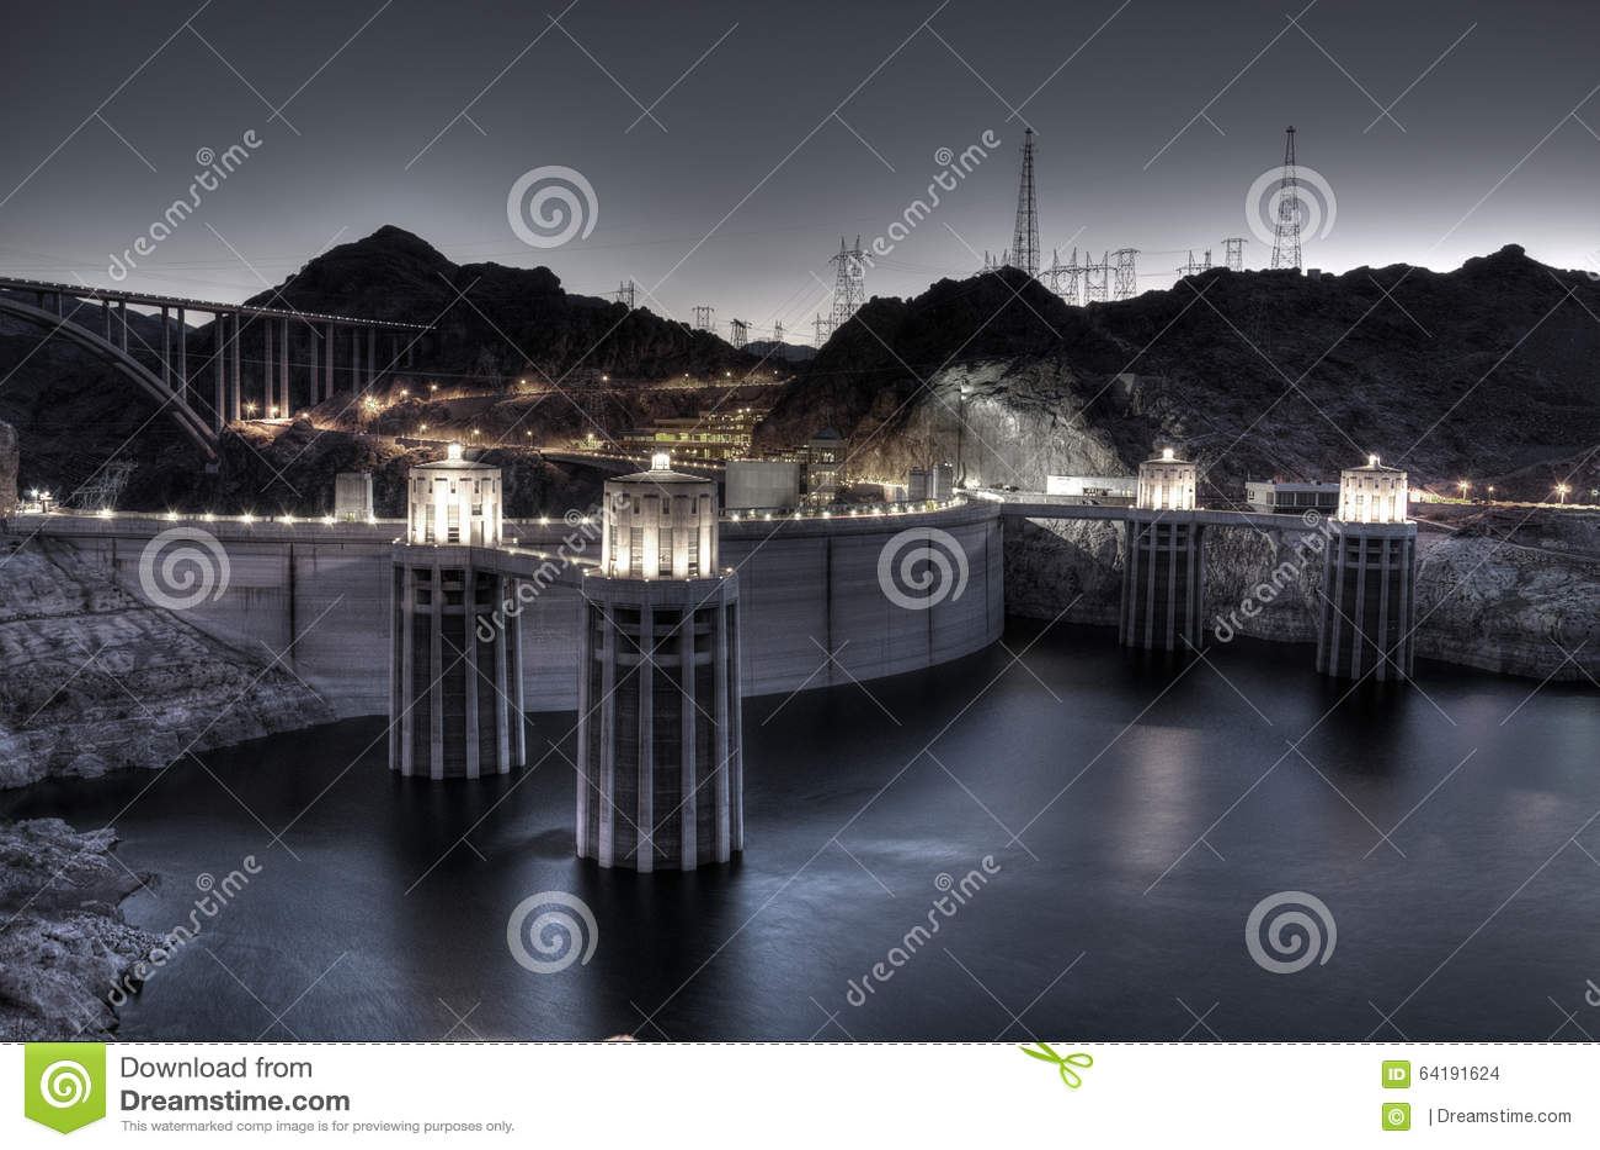 Hoover tama